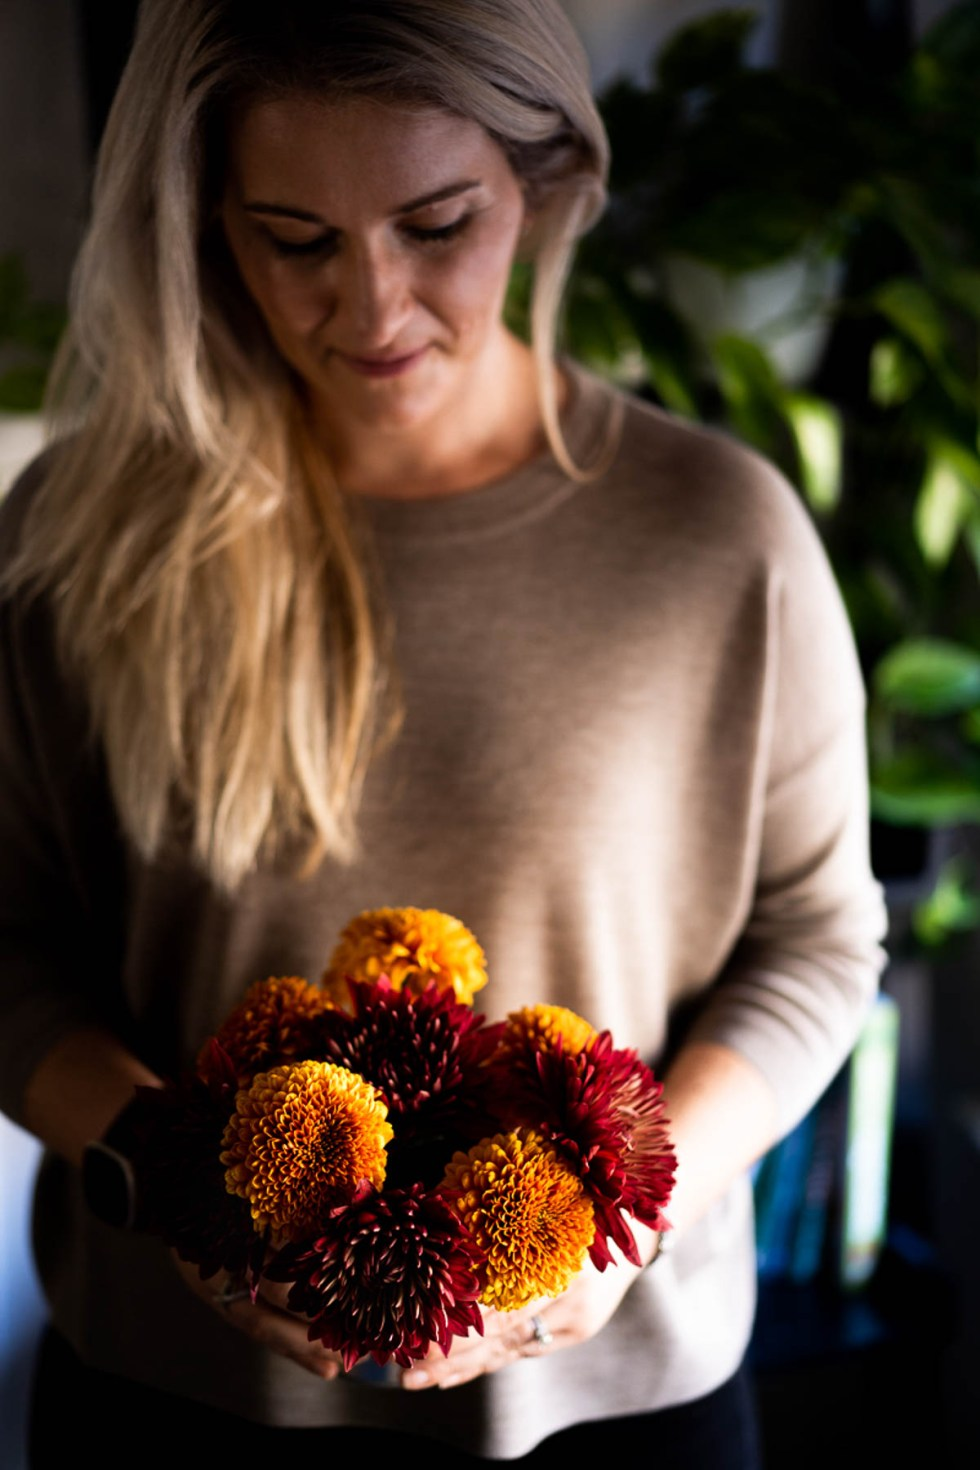 Natural Fall Decor - Red & Orange Mum Flowers